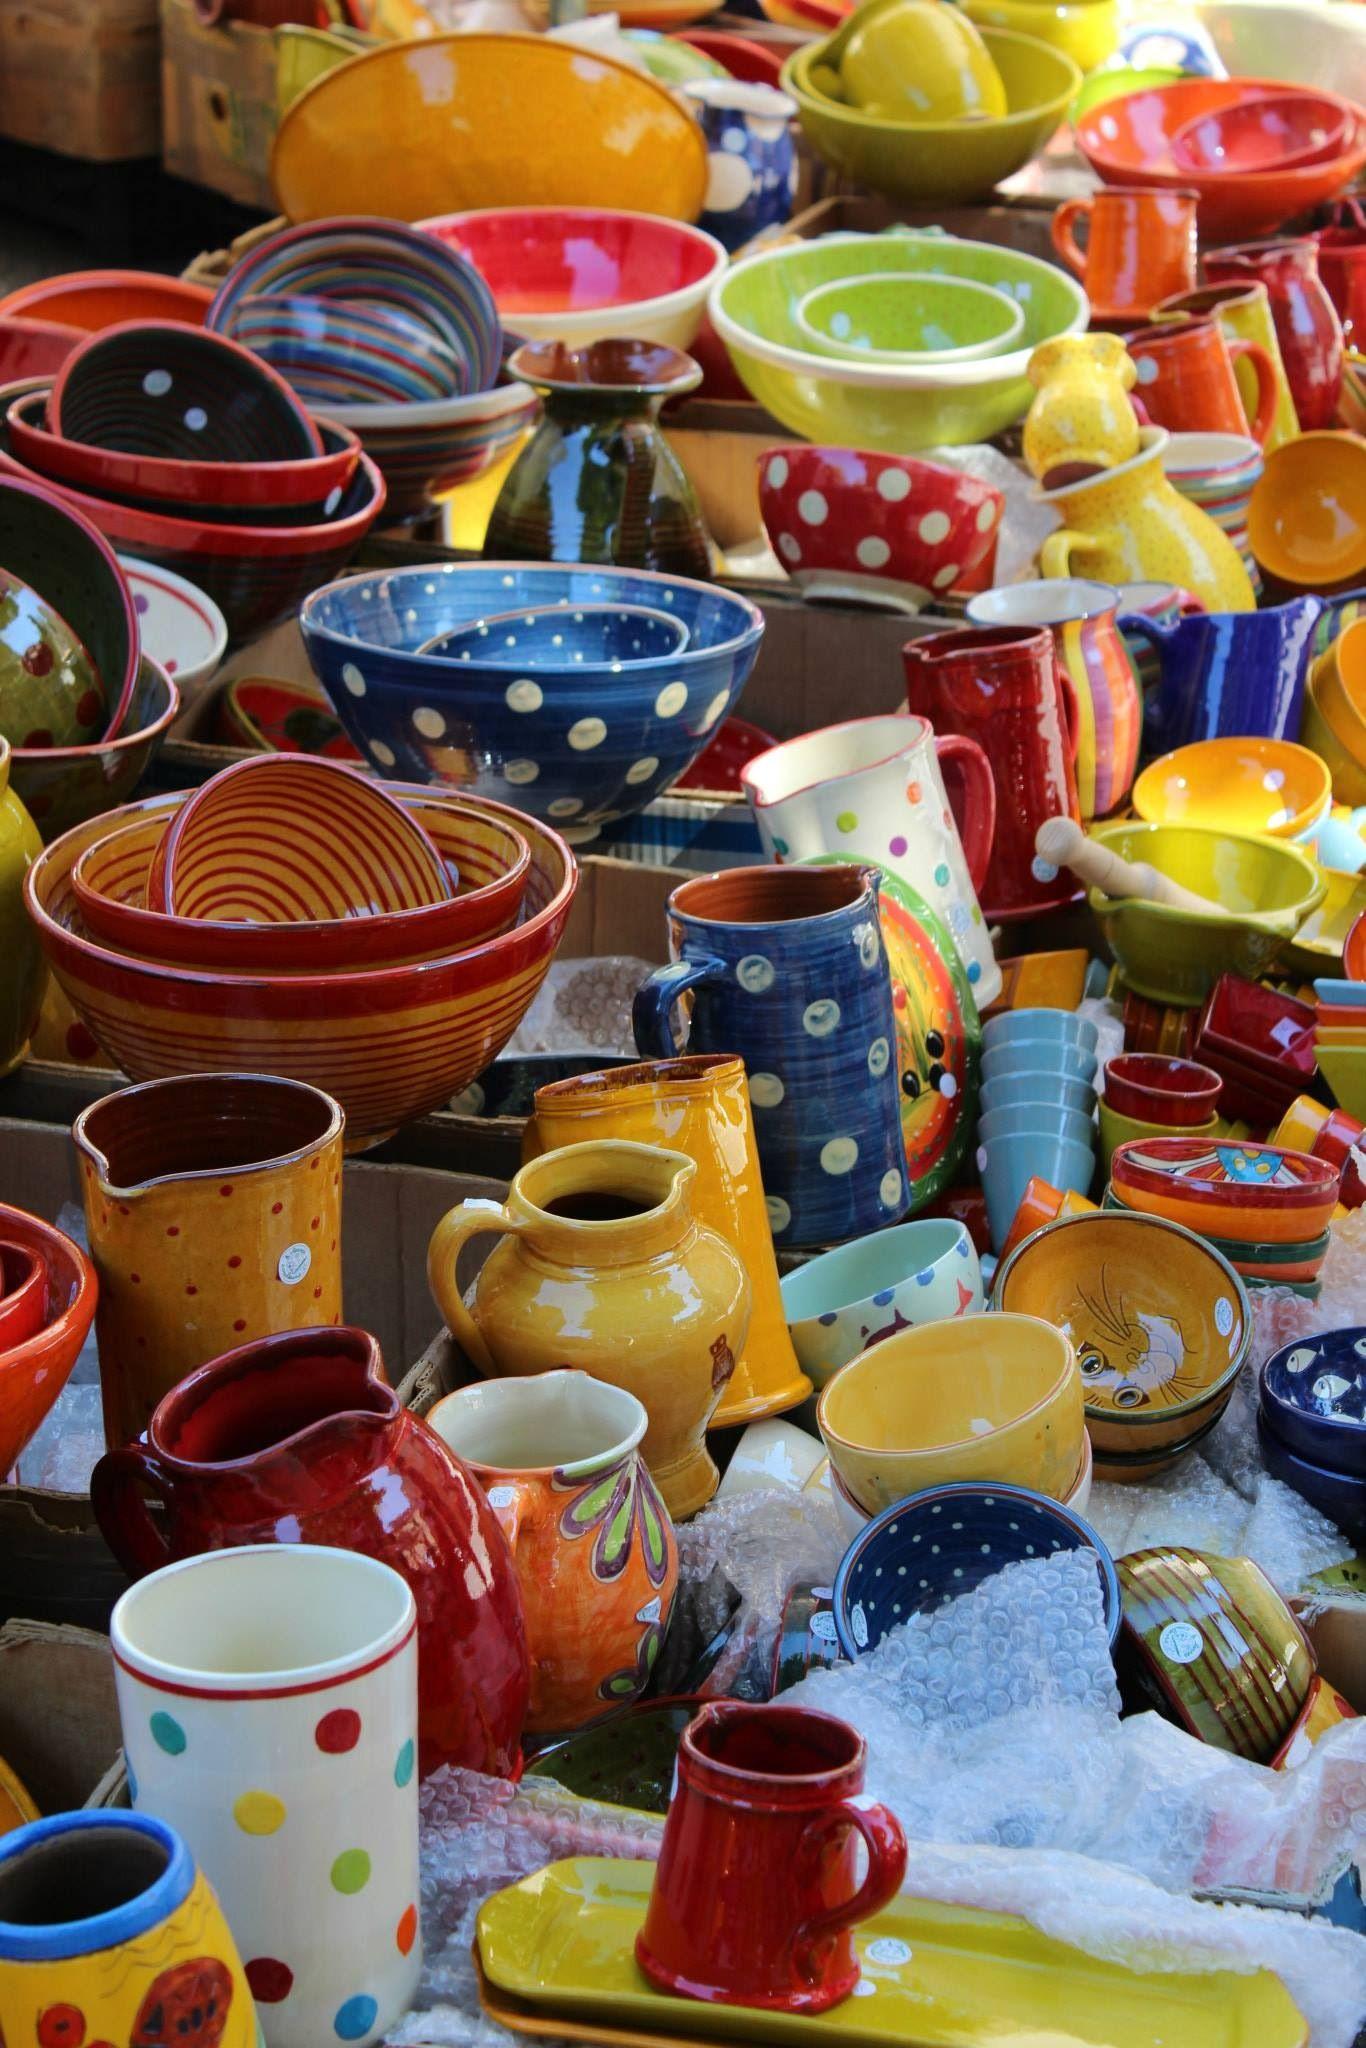 pottery aix en provence market provence france paris and france pinterest la poterie. Black Bedroom Furniture Sets. Home Design Ideas